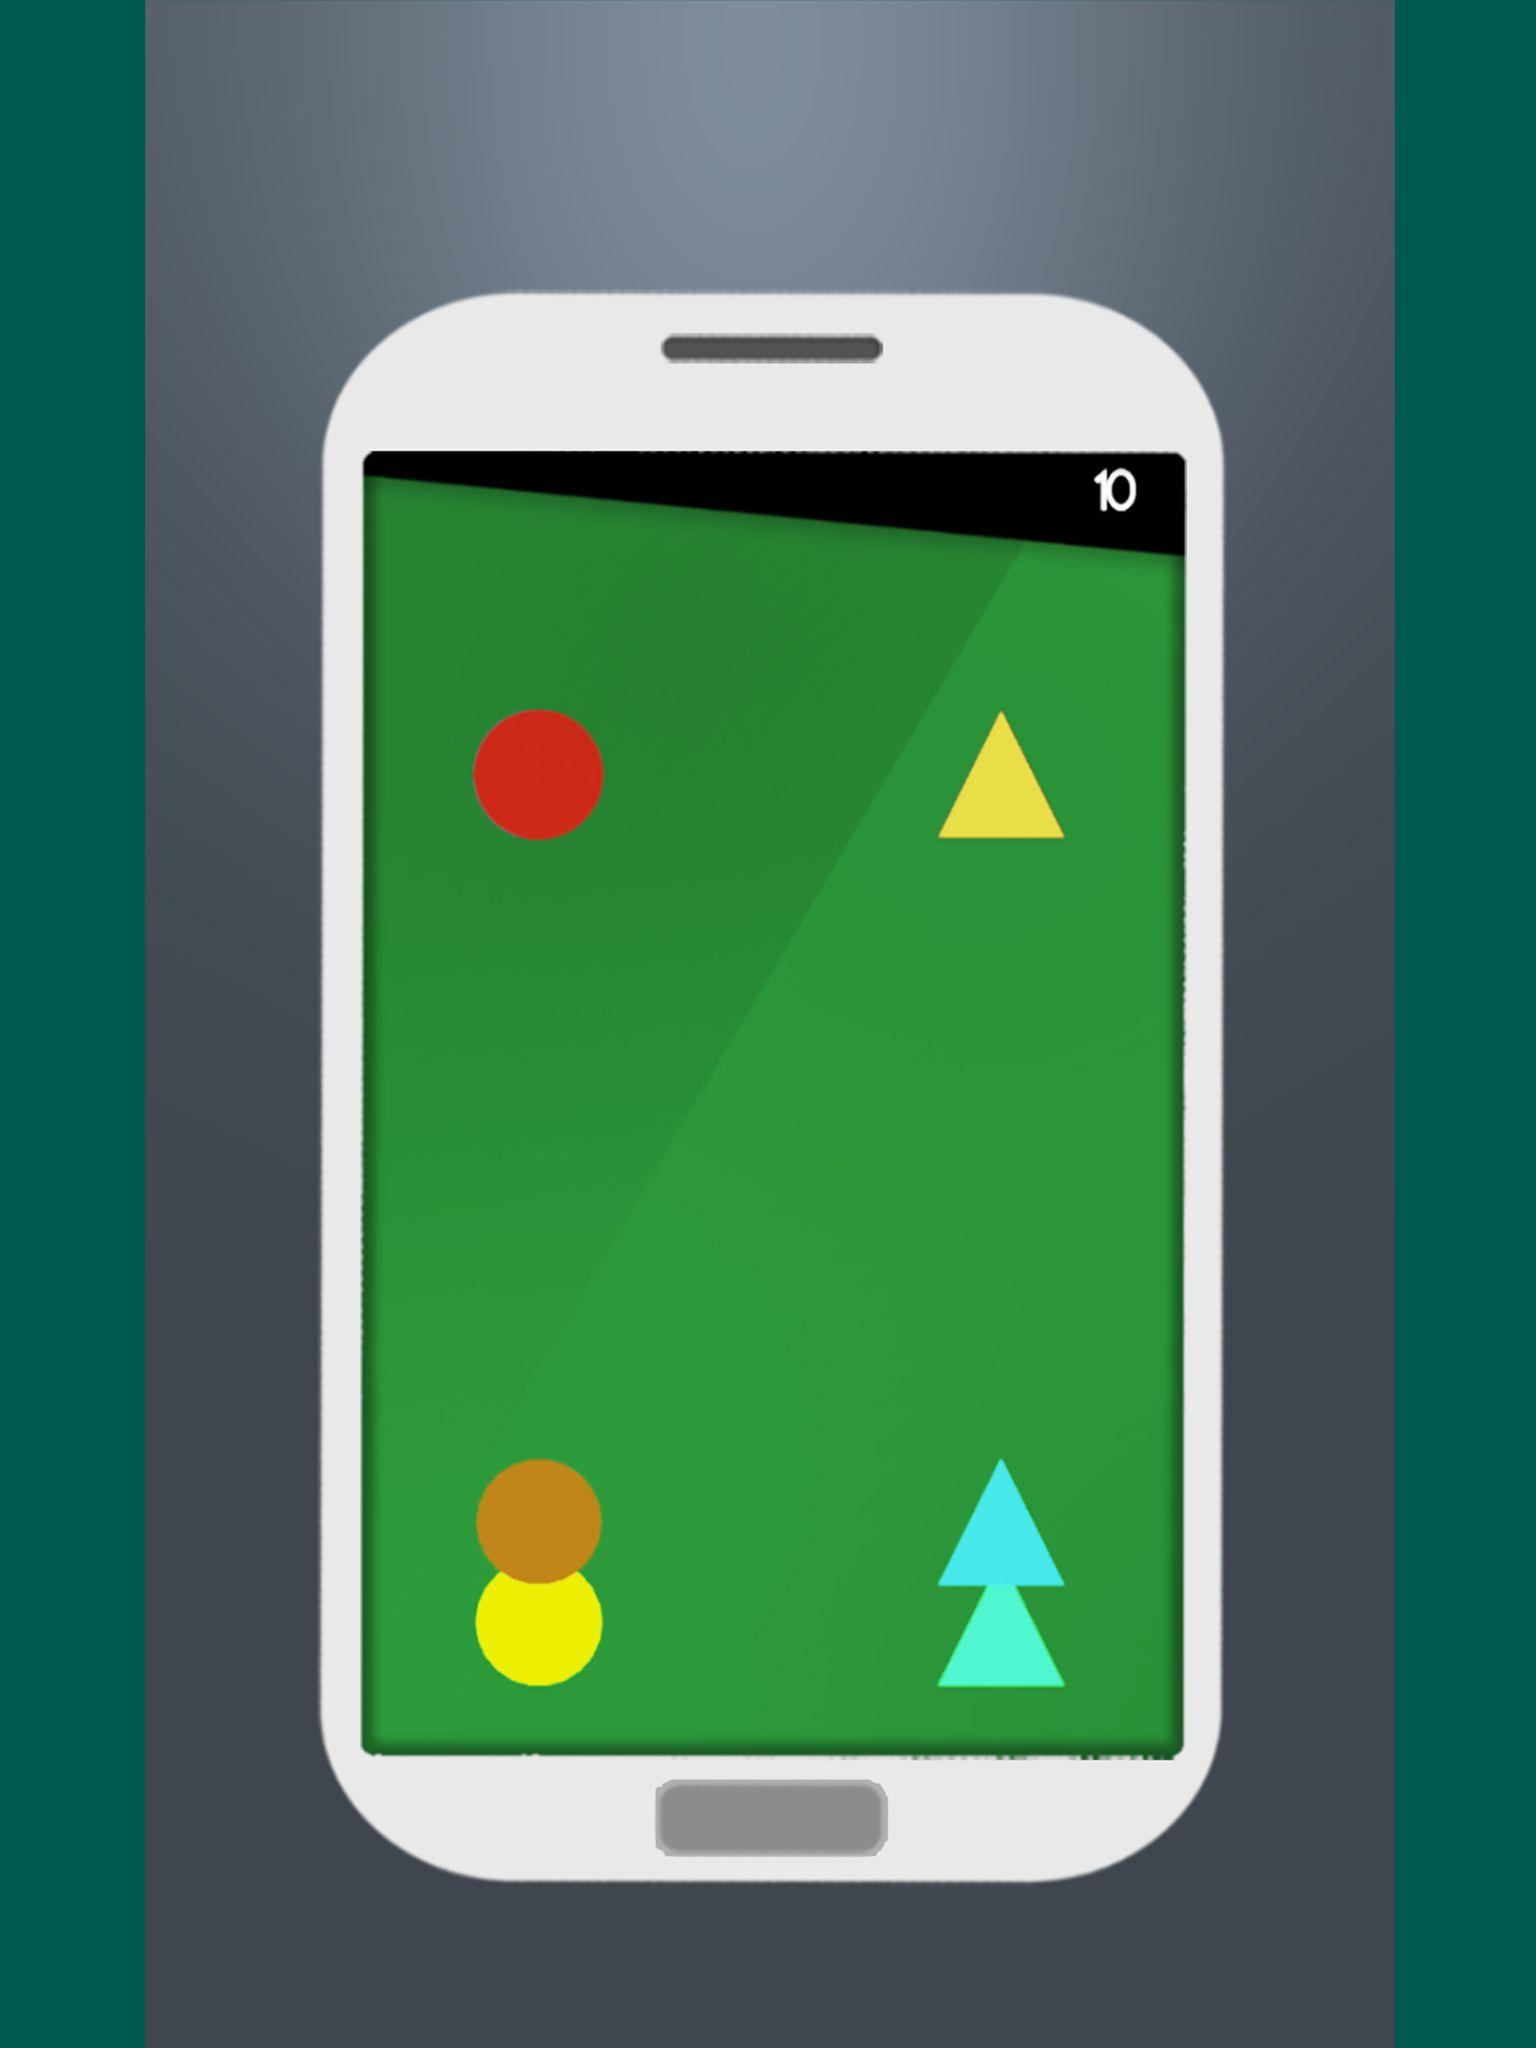 titanium app templates - shape rush 2x android app source code android app